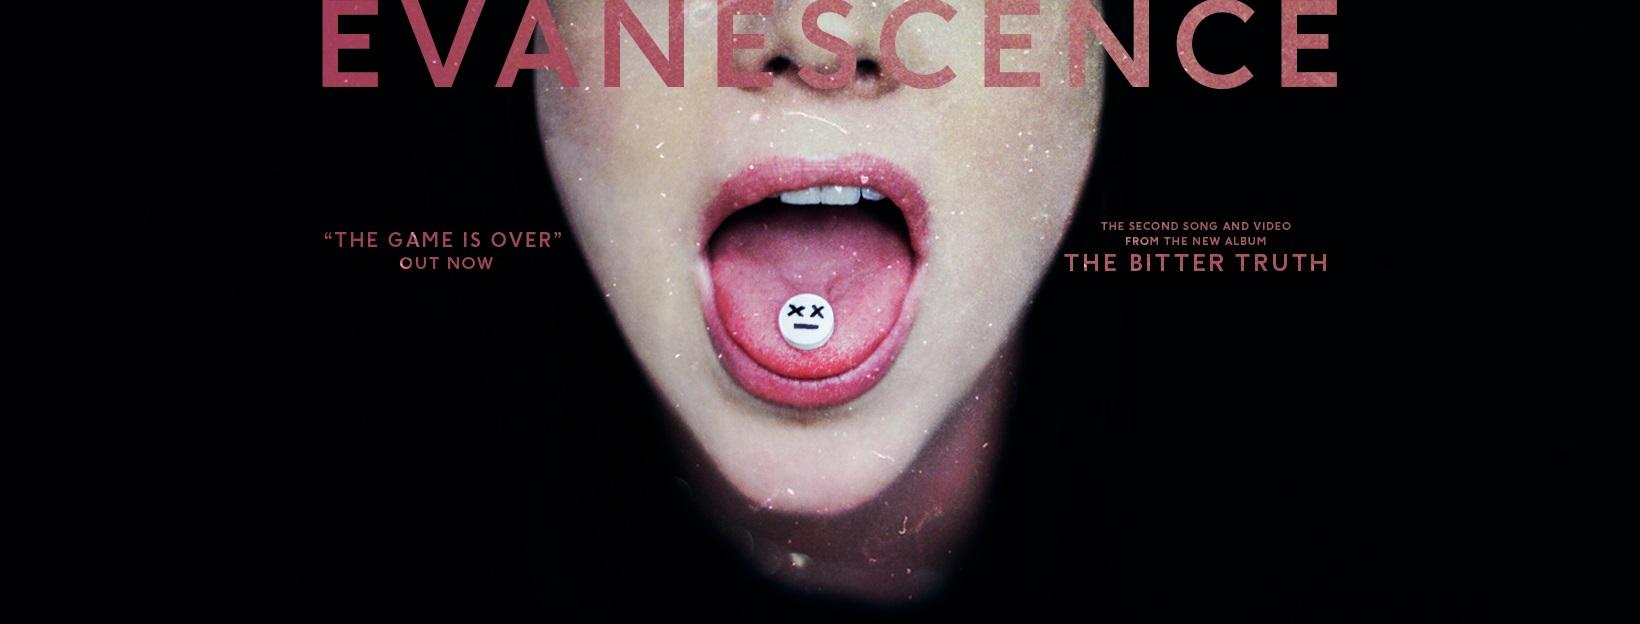 Evanescence | The Game Is Over | Μόλις κυκλοφόρησε!